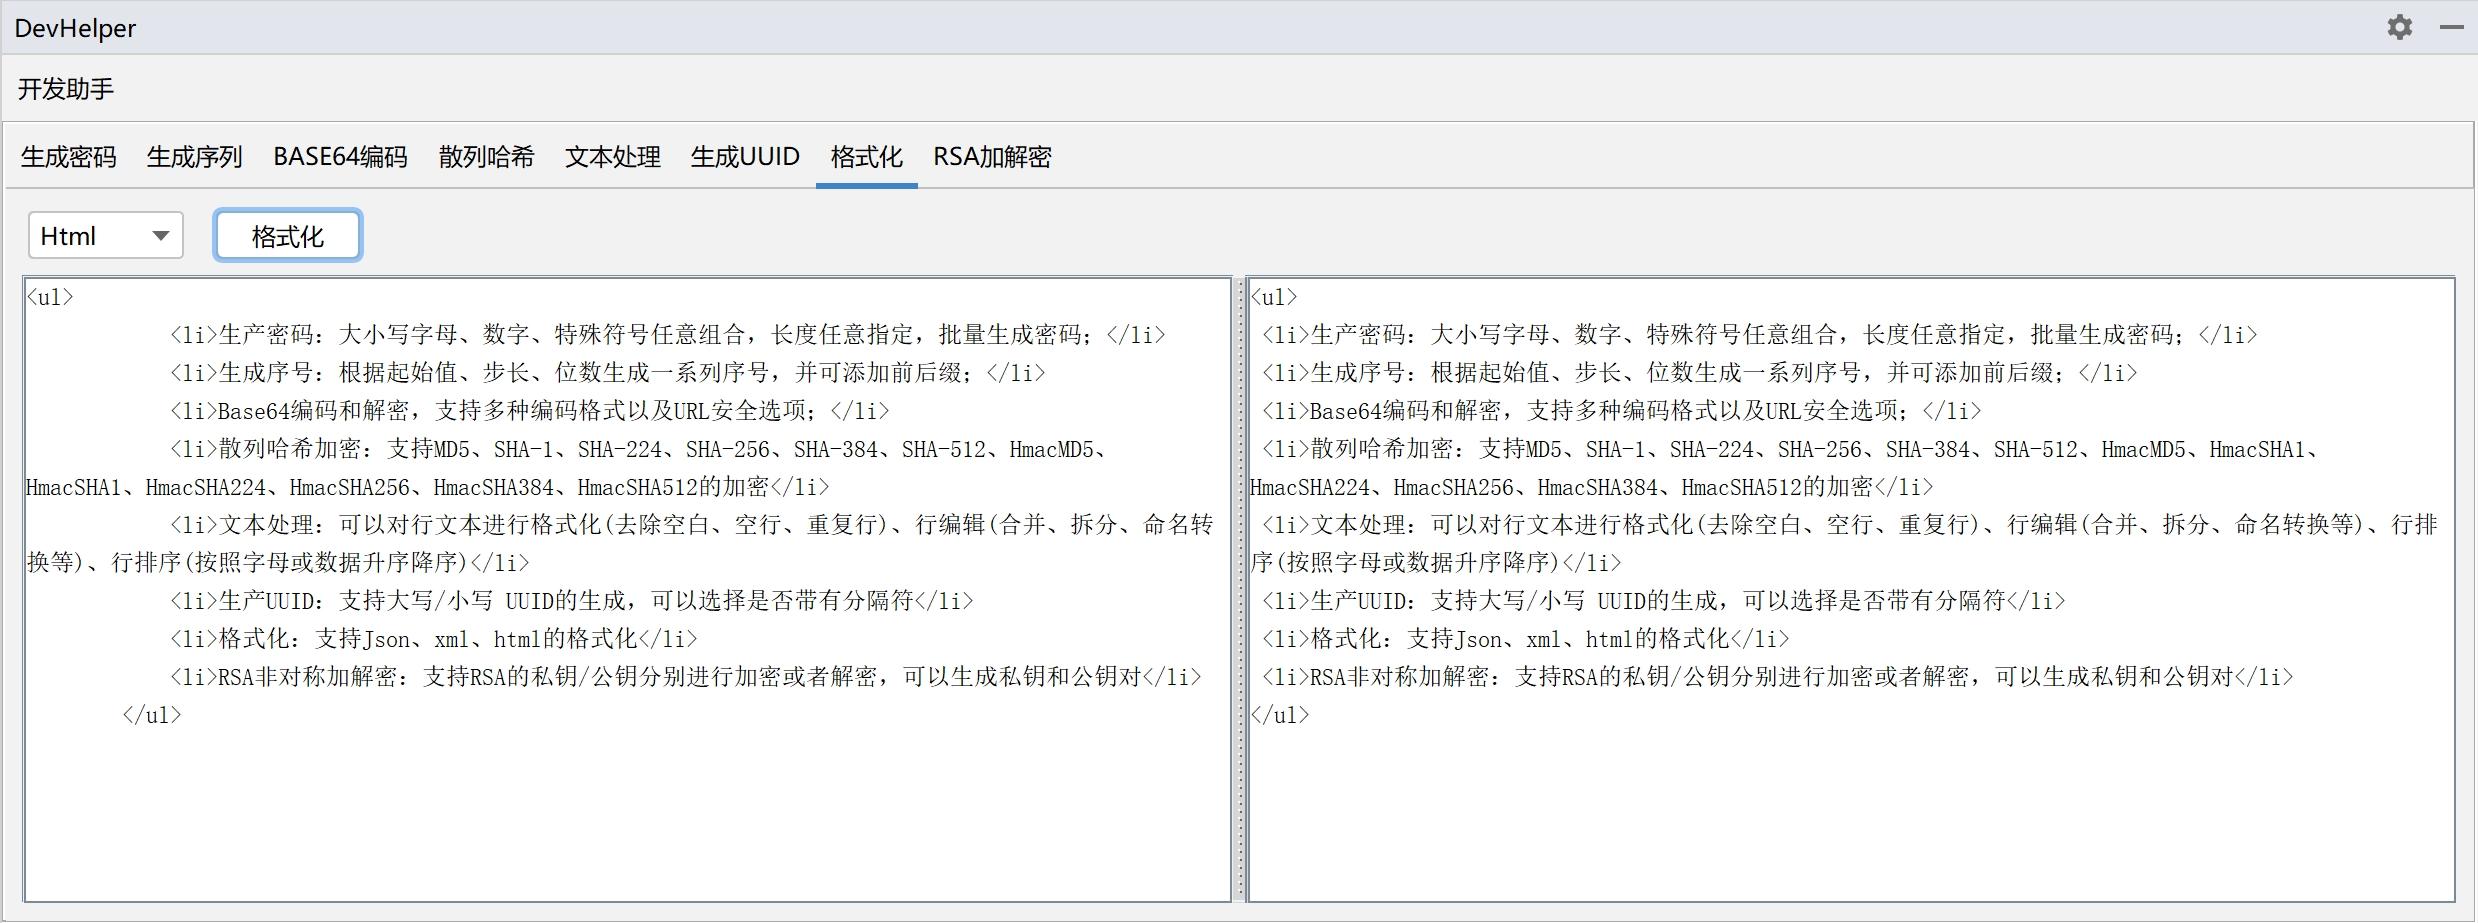 IntelliJ IDEA 开发助手插件DevHelper 1.0.2版本发布